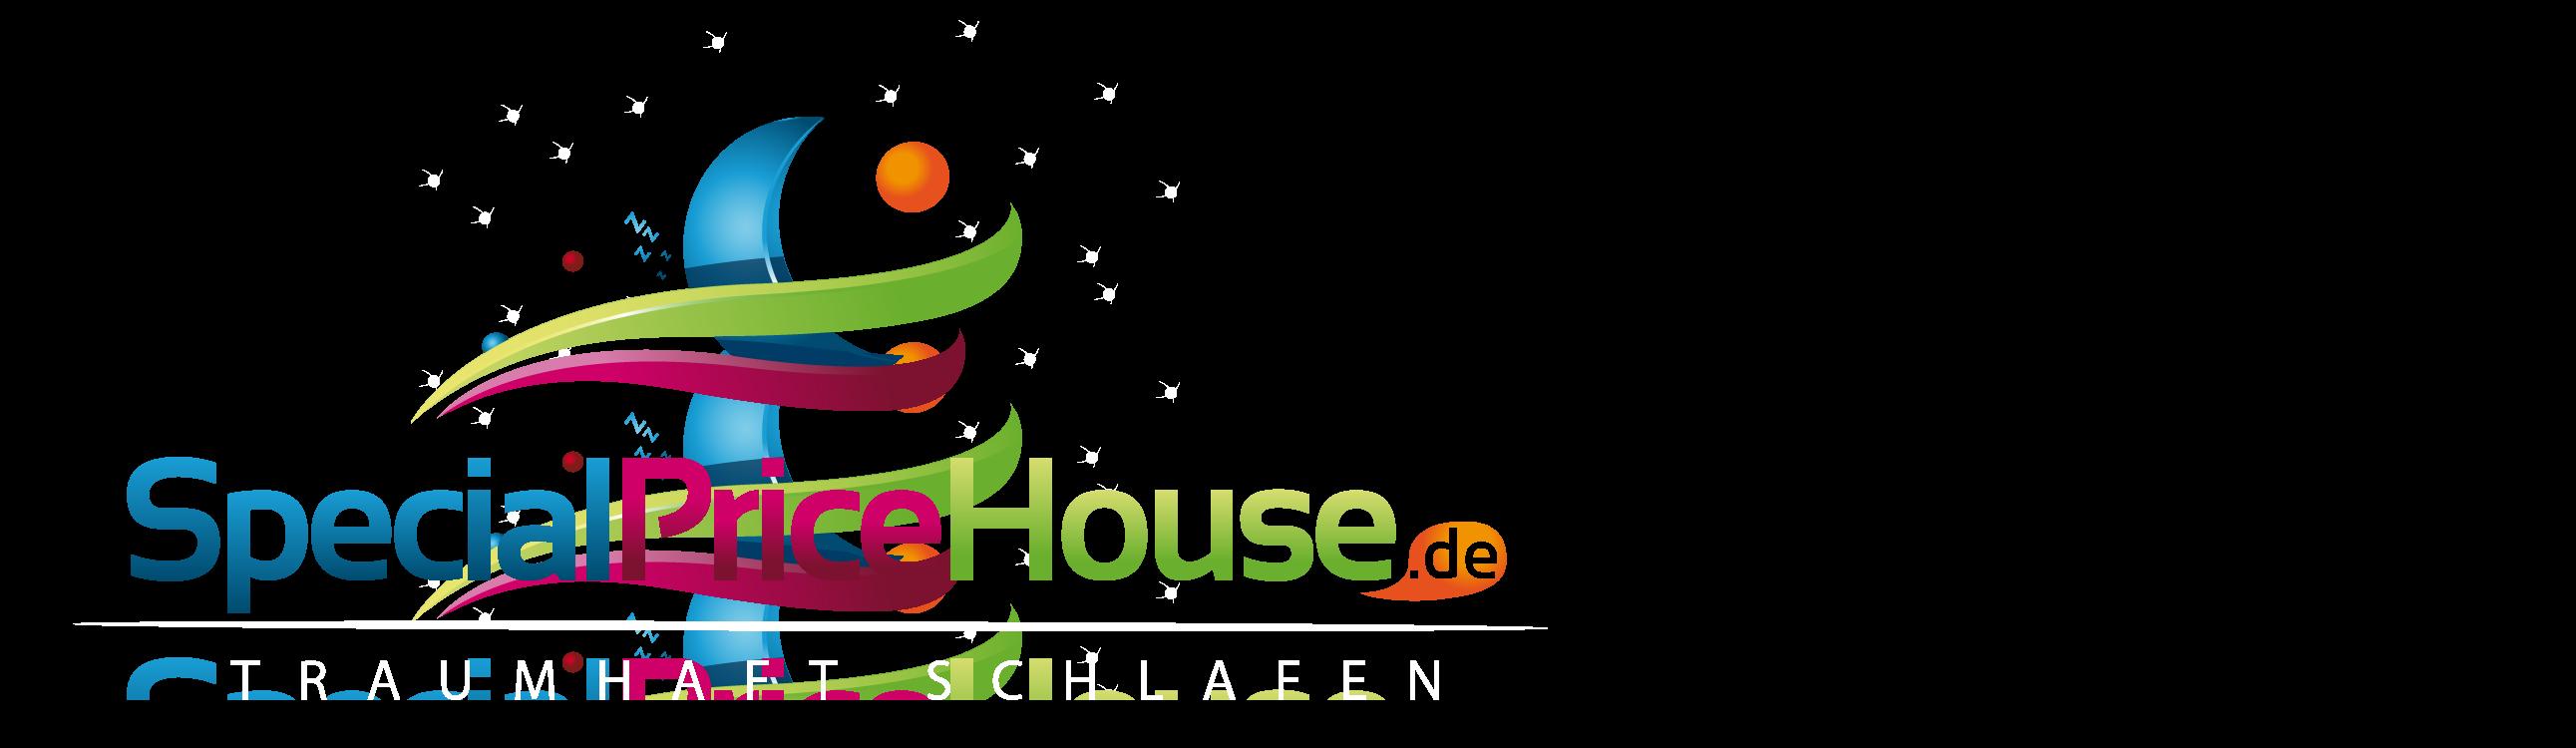 specialpricehouse